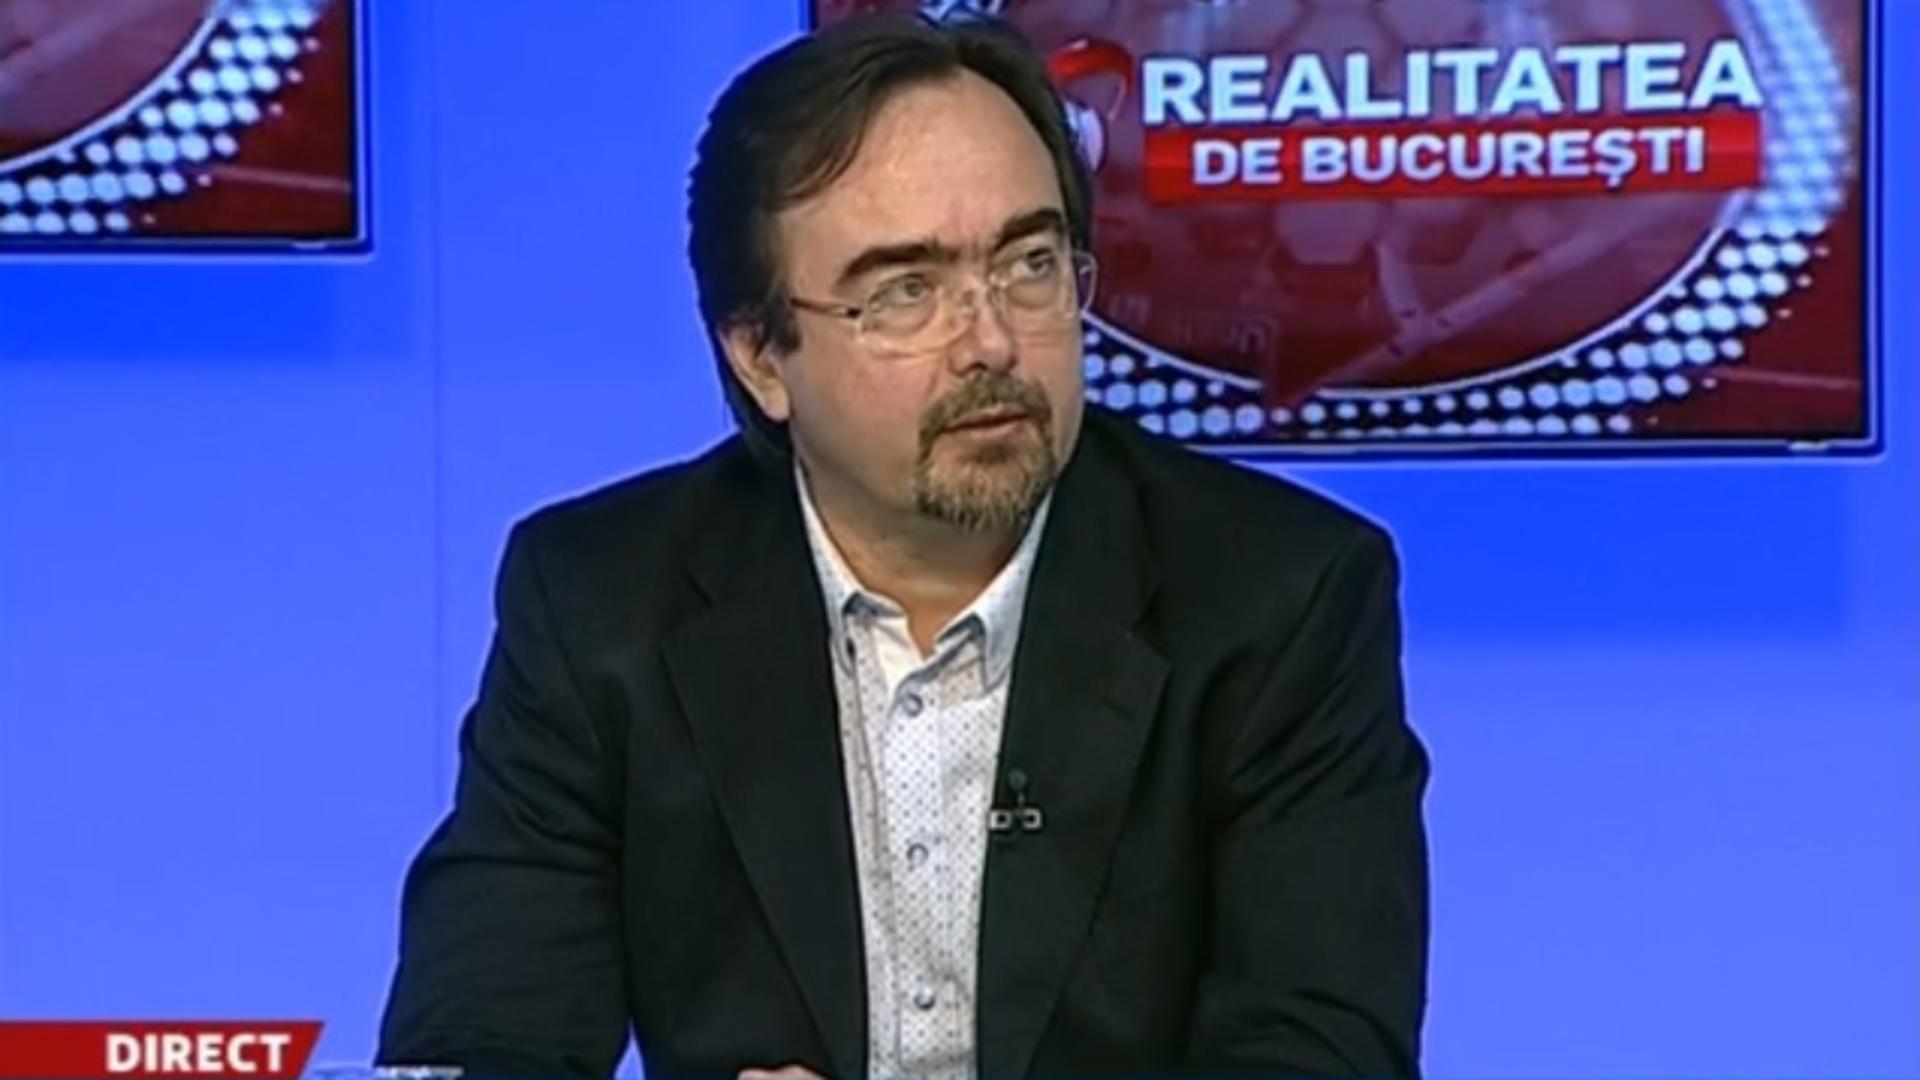 Alin Stoica